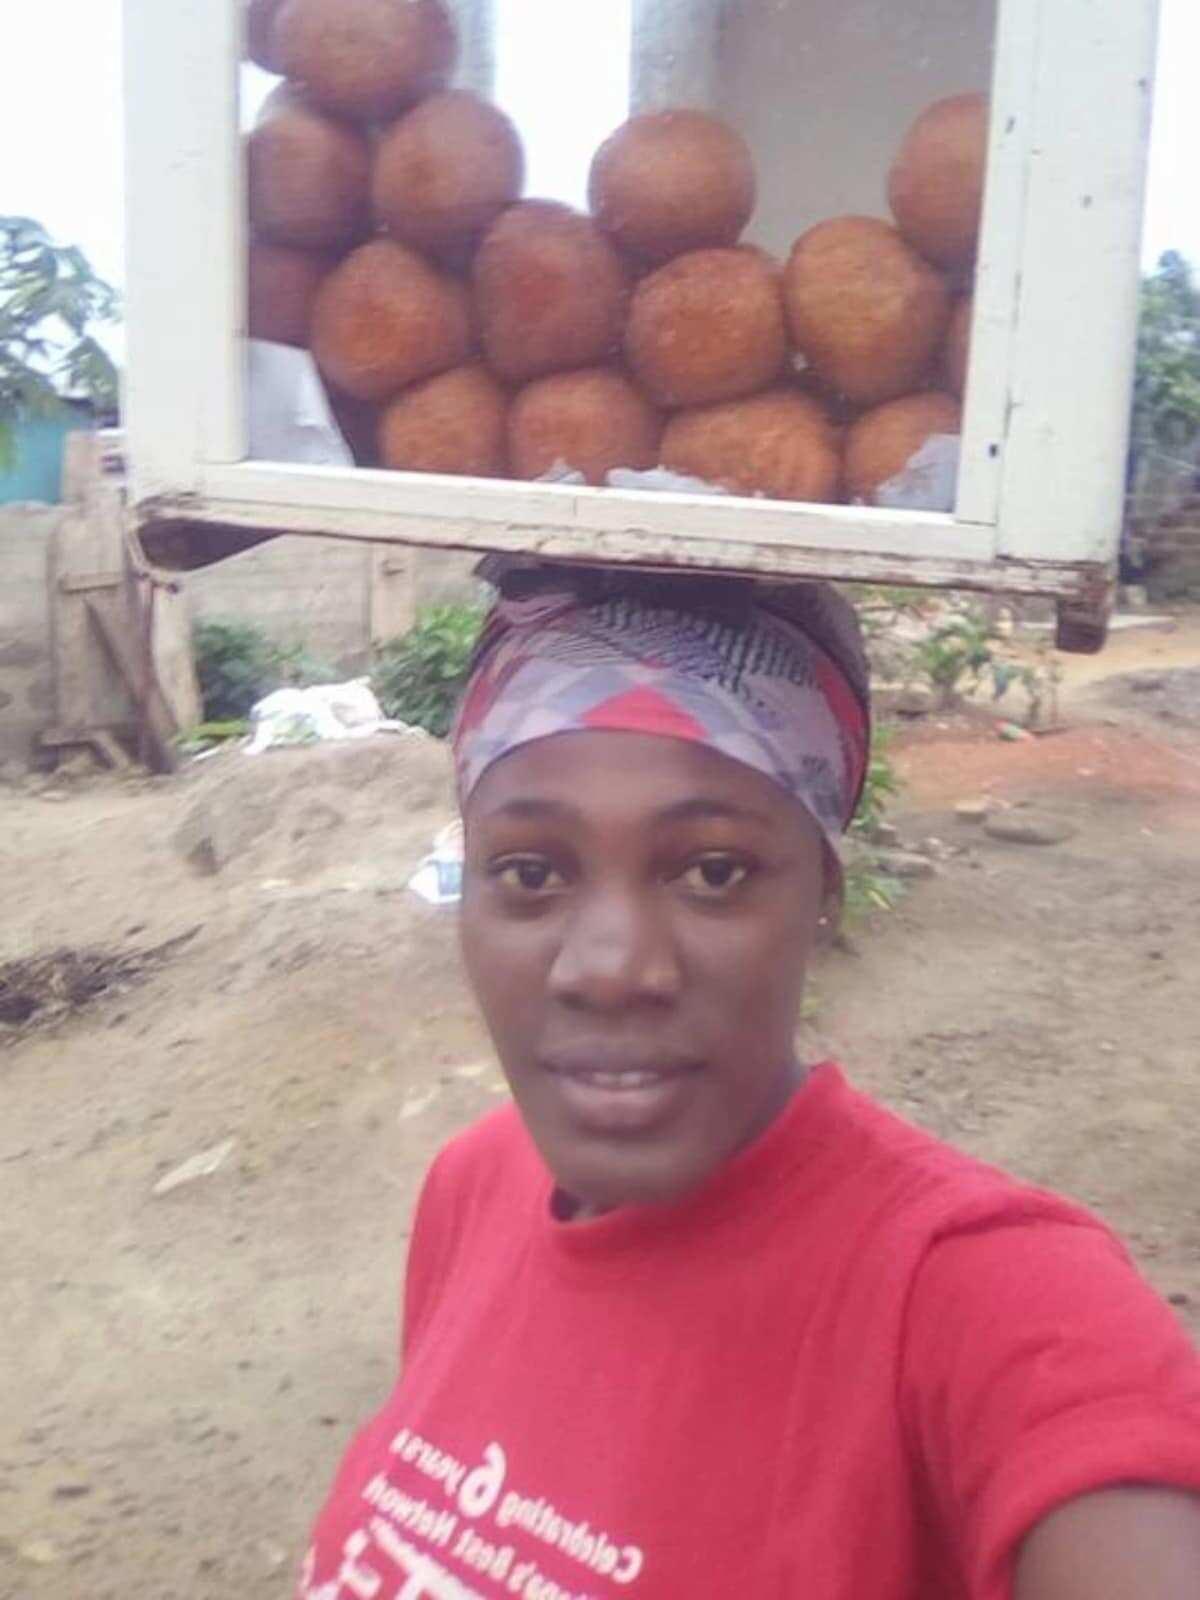 Photos of pretty 'bofrot' seller warms hearts on social media